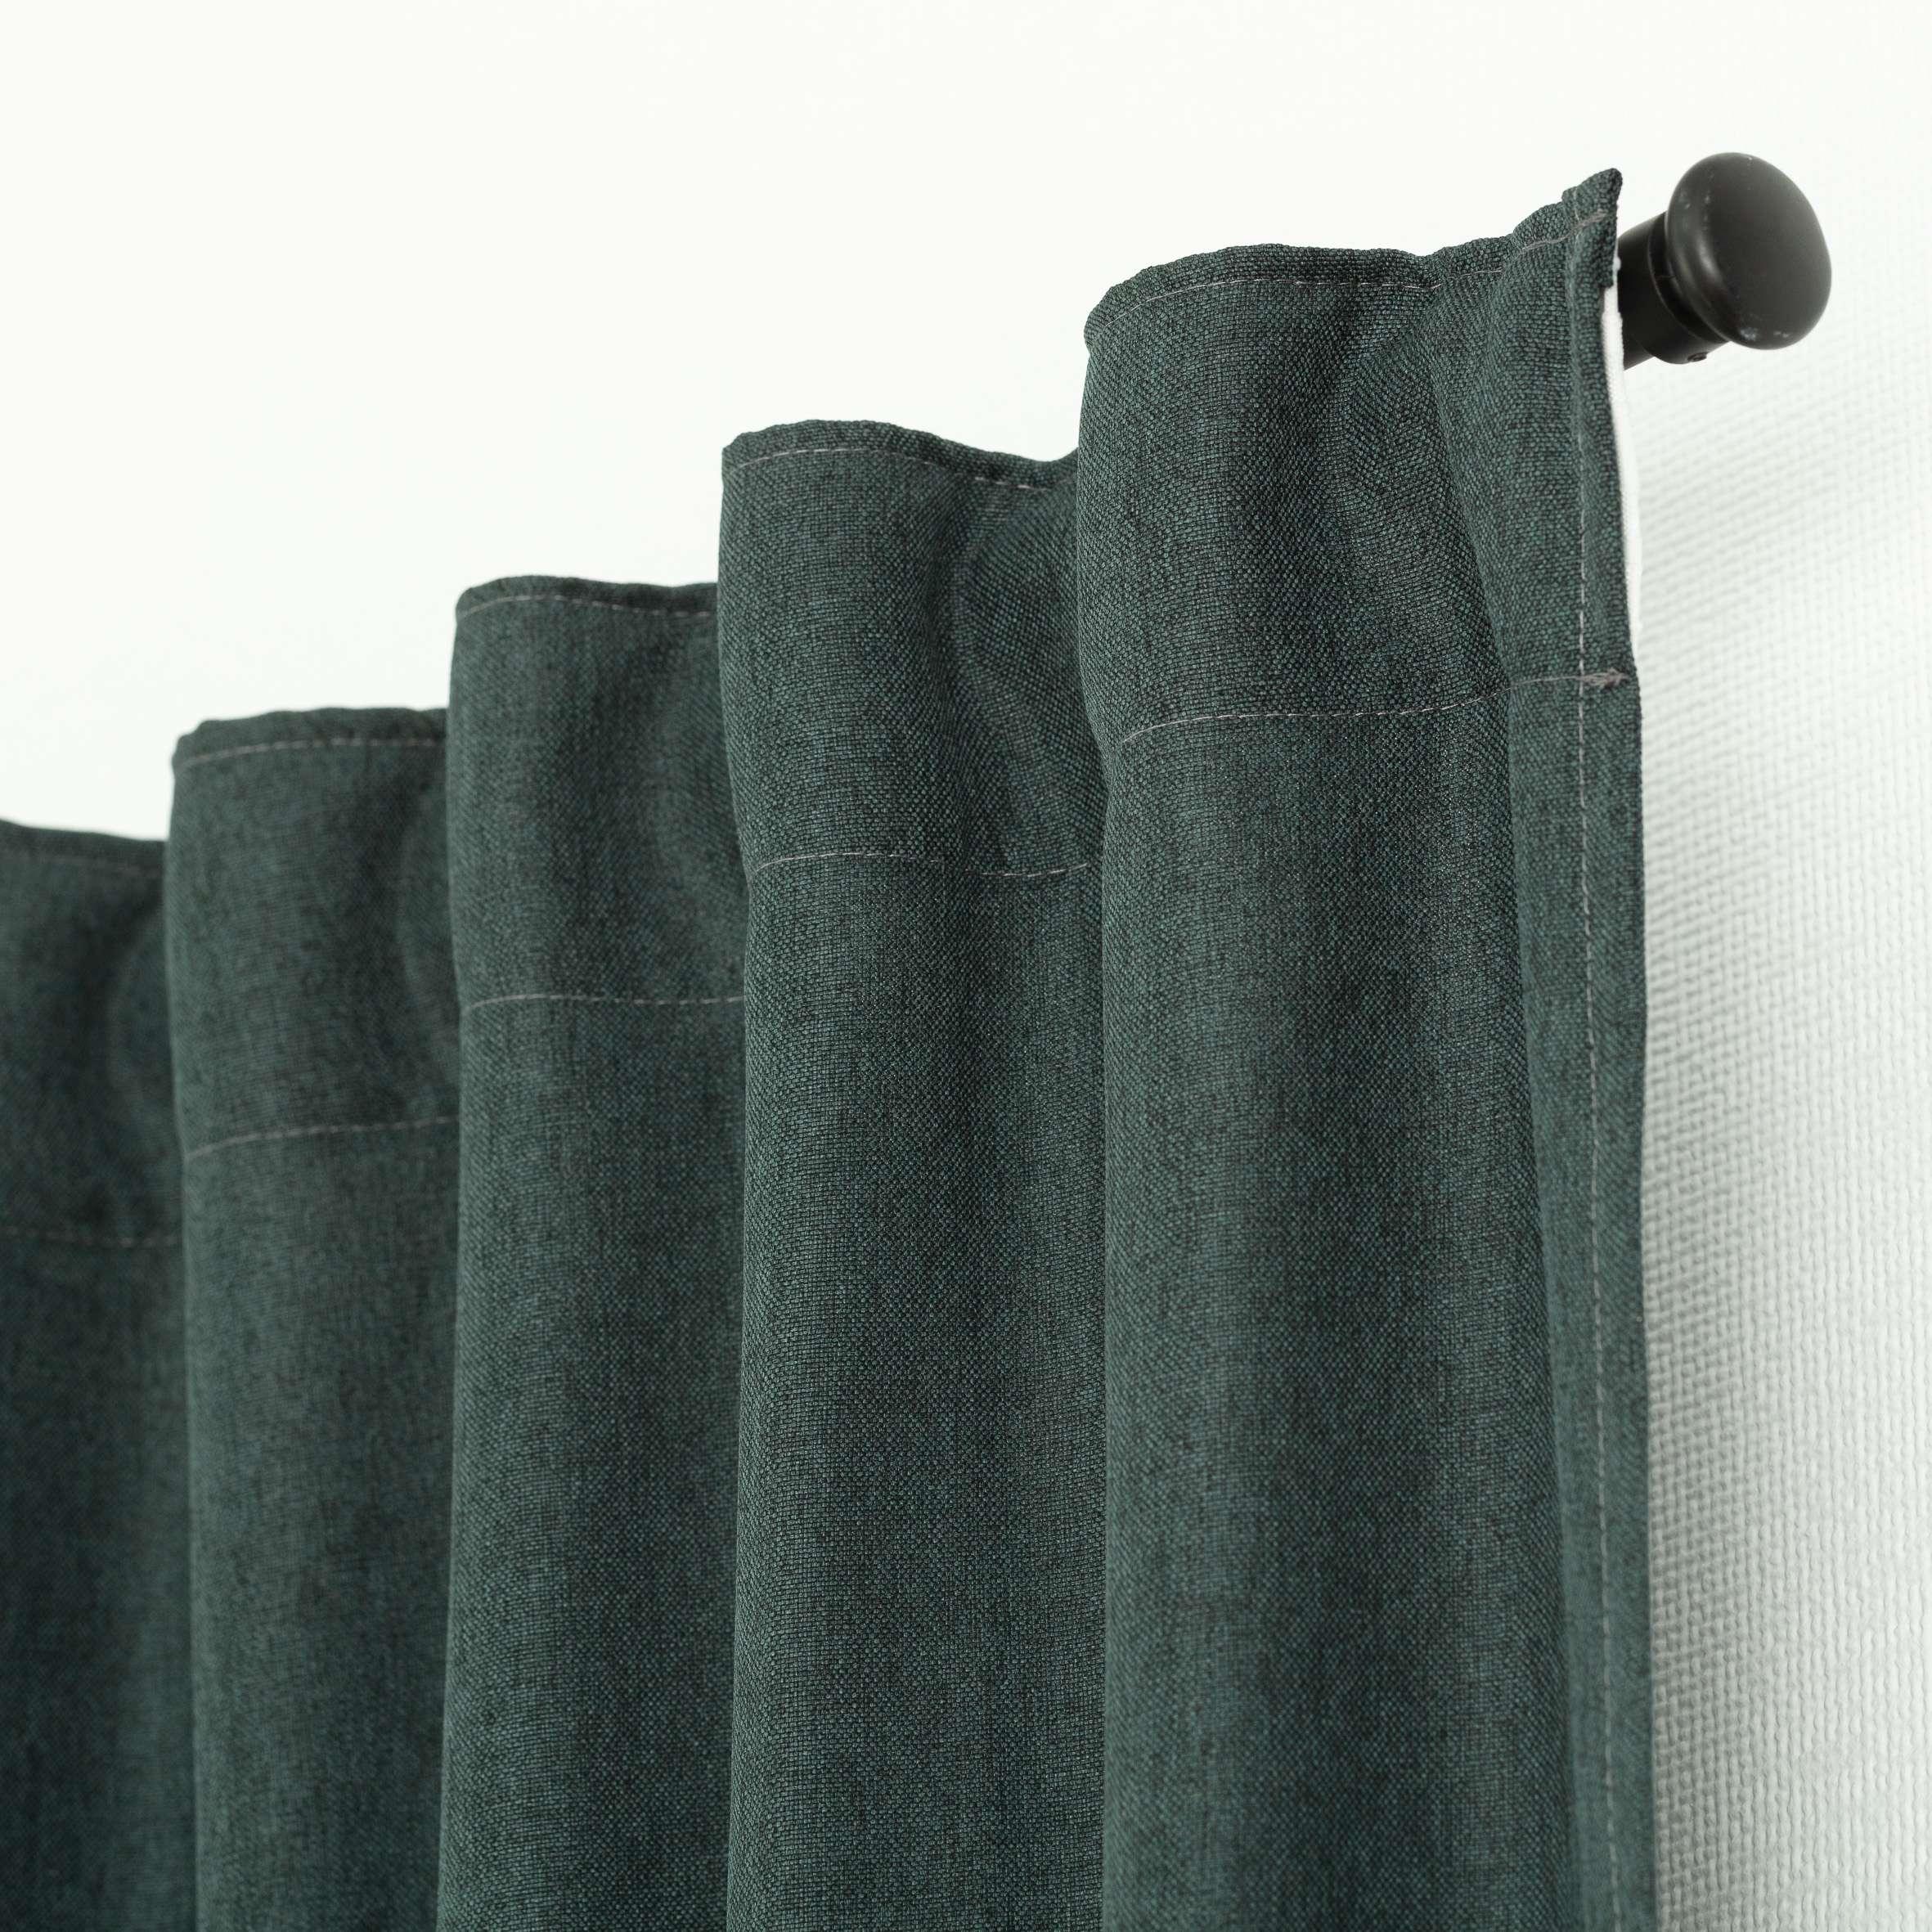 Fertigvorhang BASIC mit Kräuselband 140x300cm, dunkelgrün